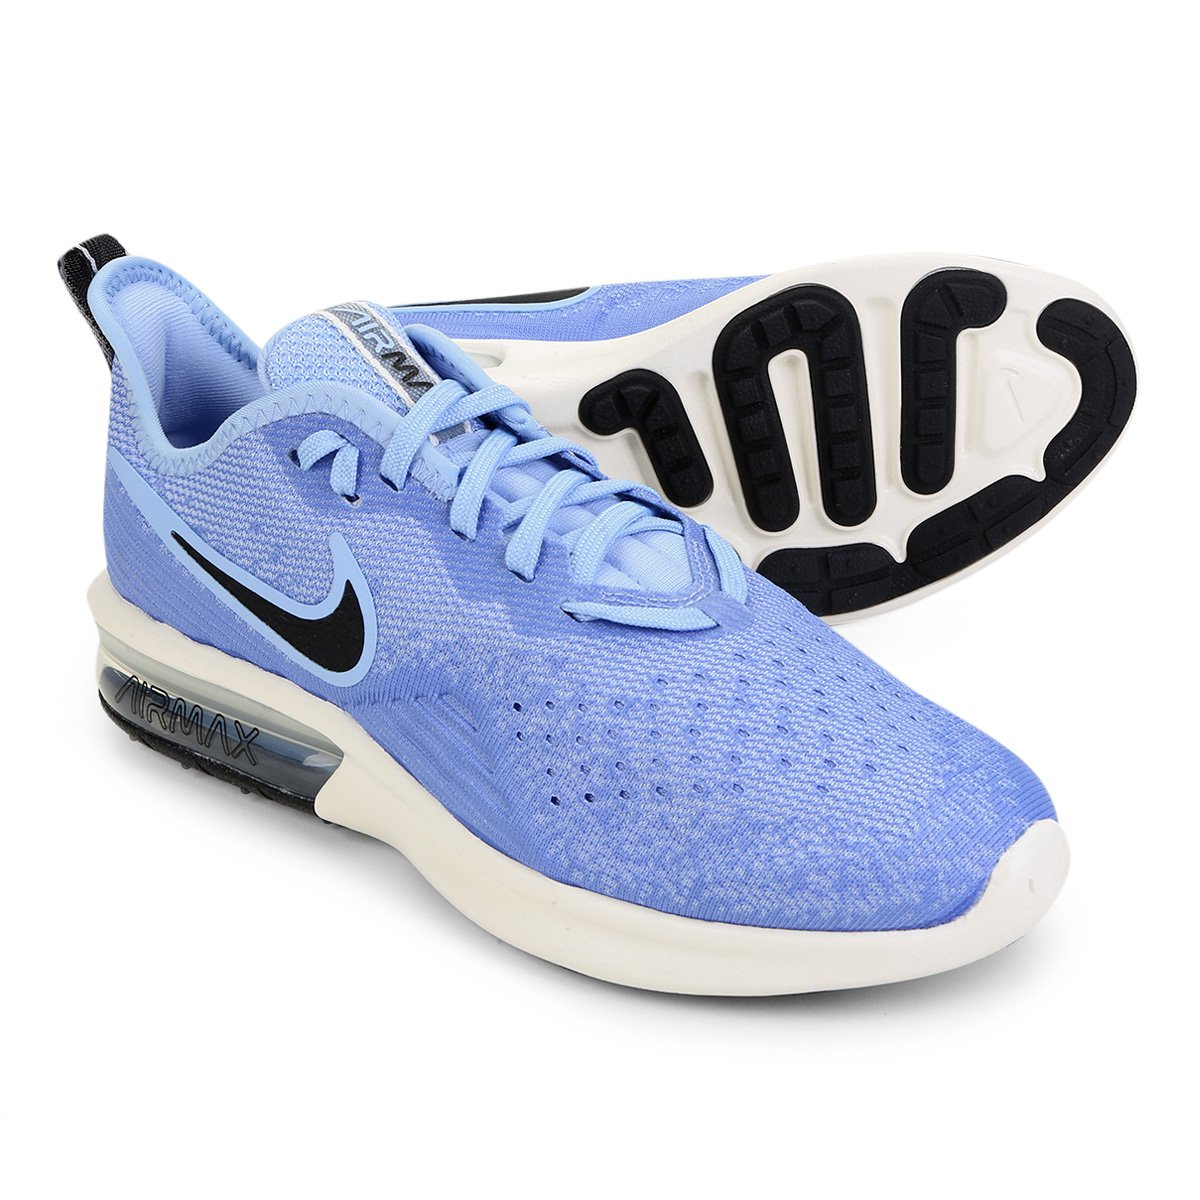 807f1b5637 Tênis Nike Air Max Sequent 4 Feminino - Azul Claro - Compre Agora ...